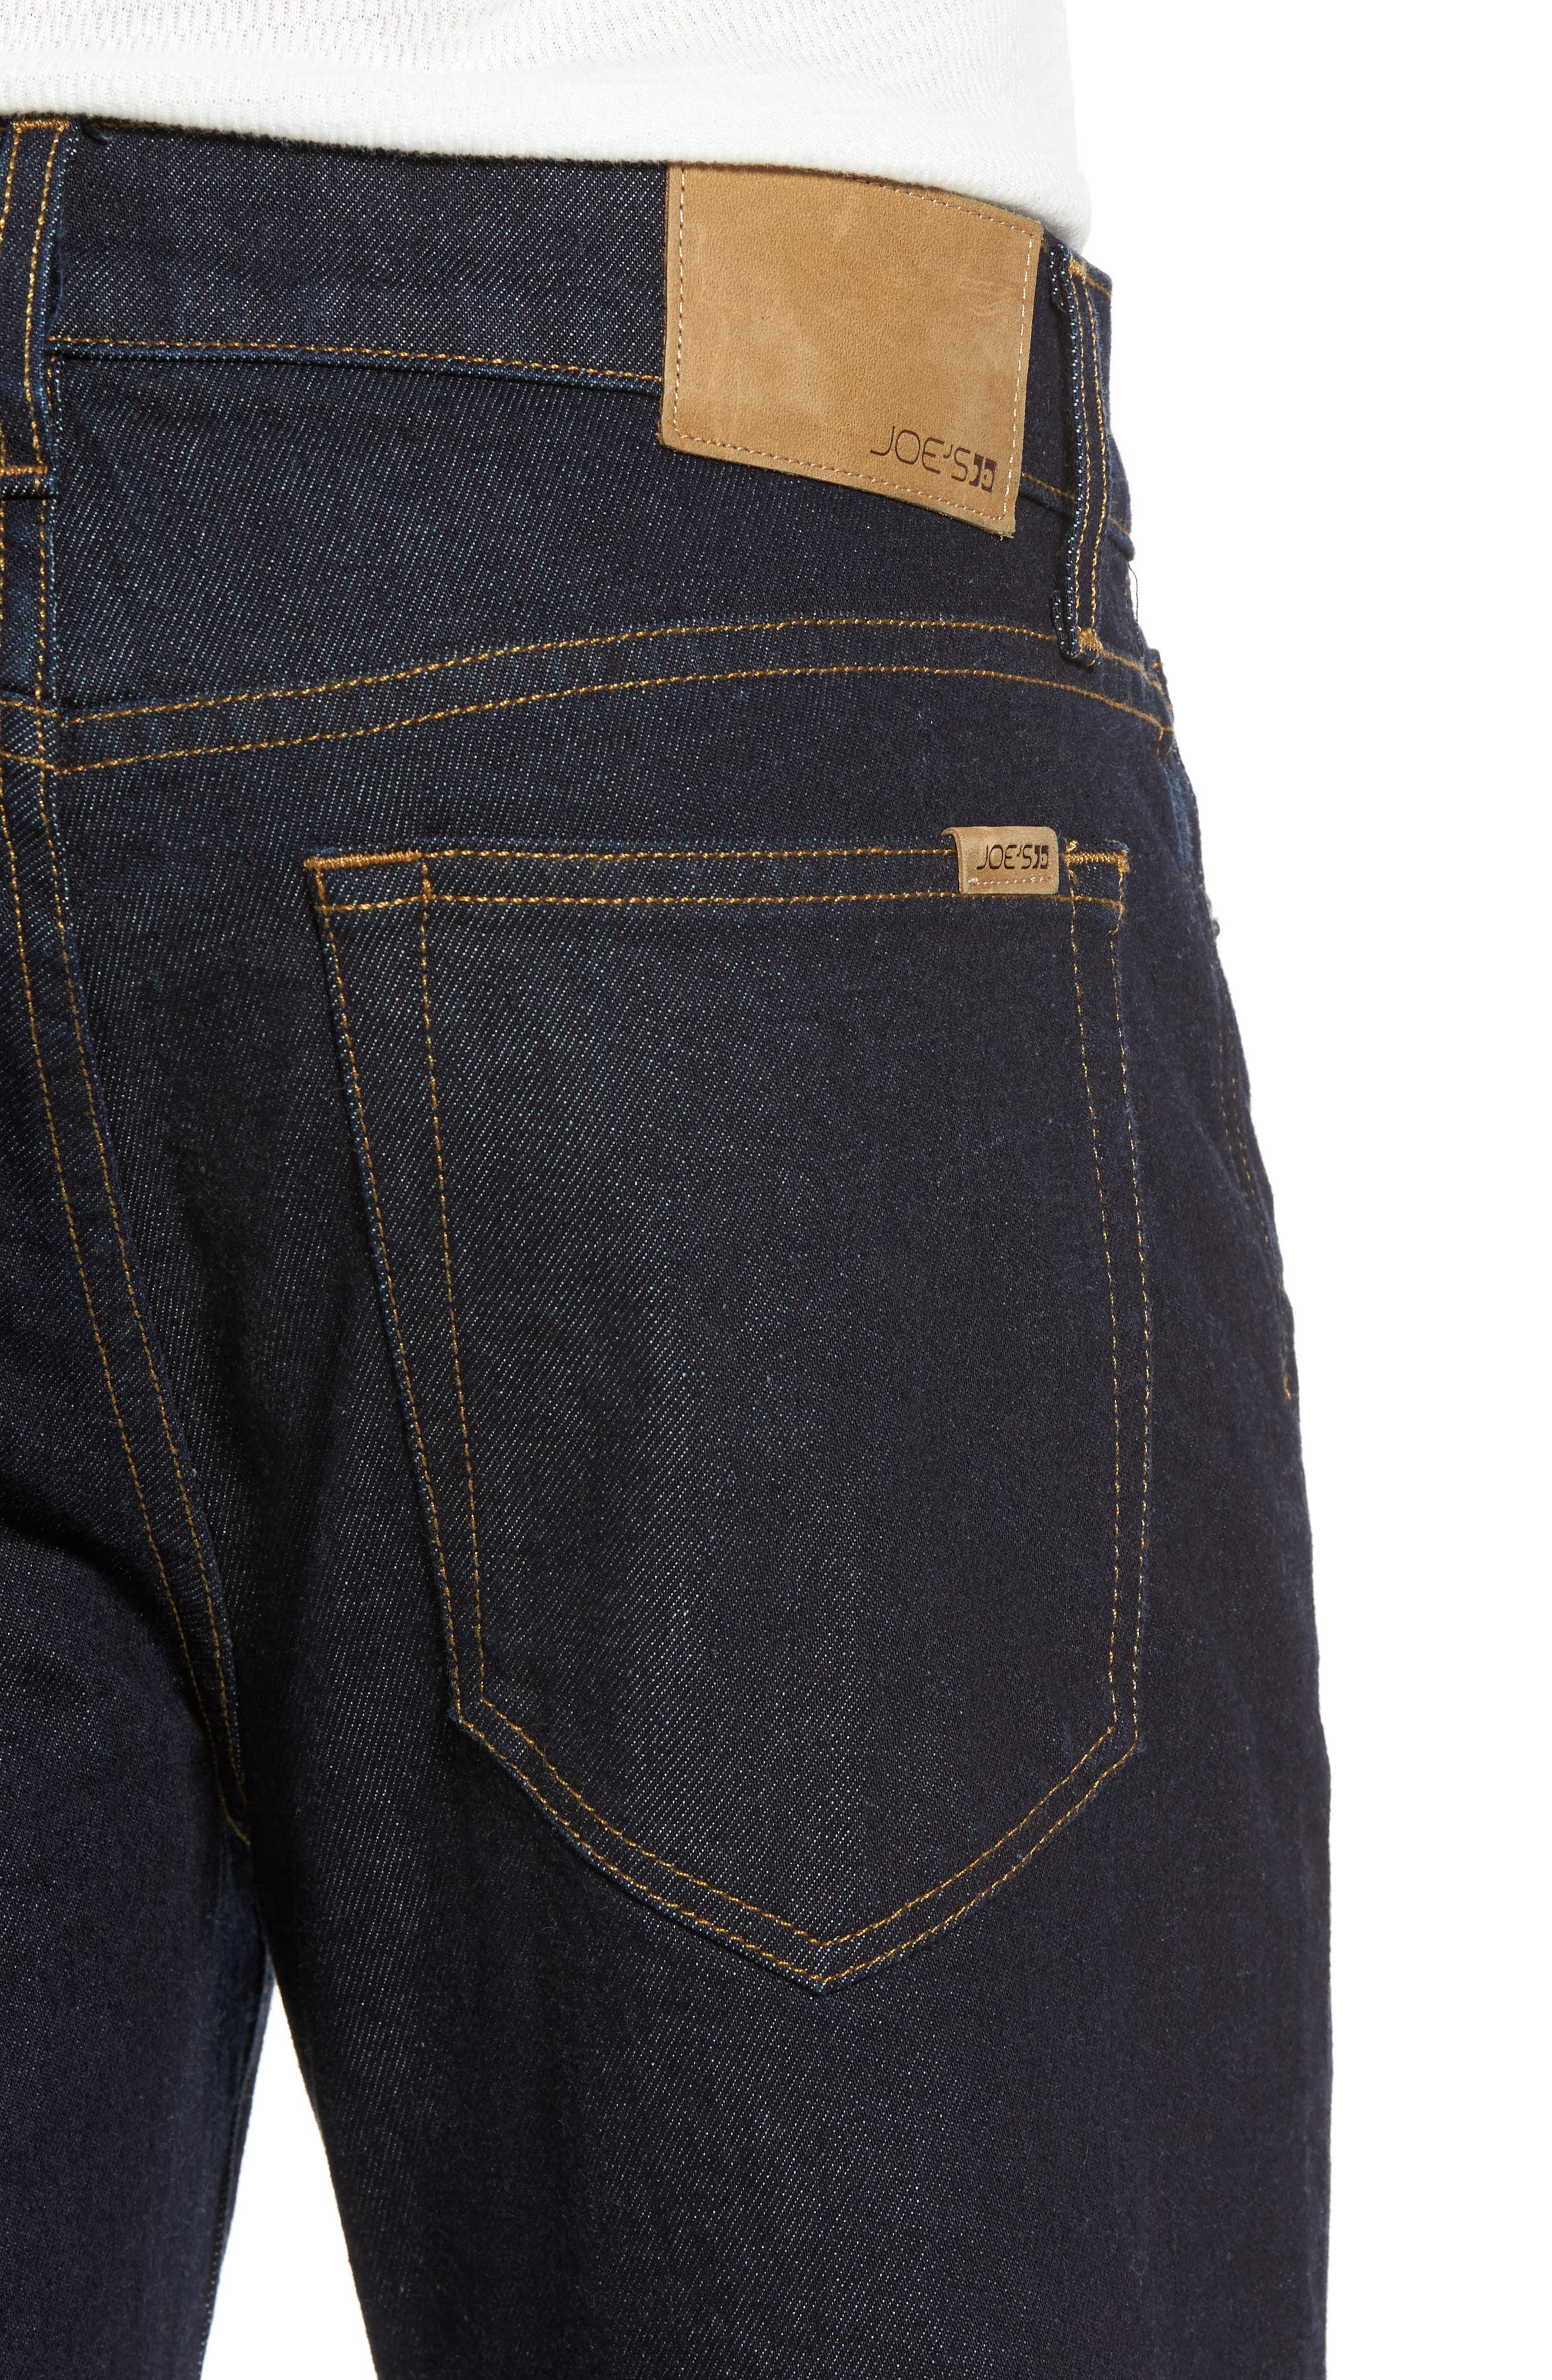 Brixton Slim Straight Leg Jeans,                             Alternate thumbnail 4, color,                             Halford